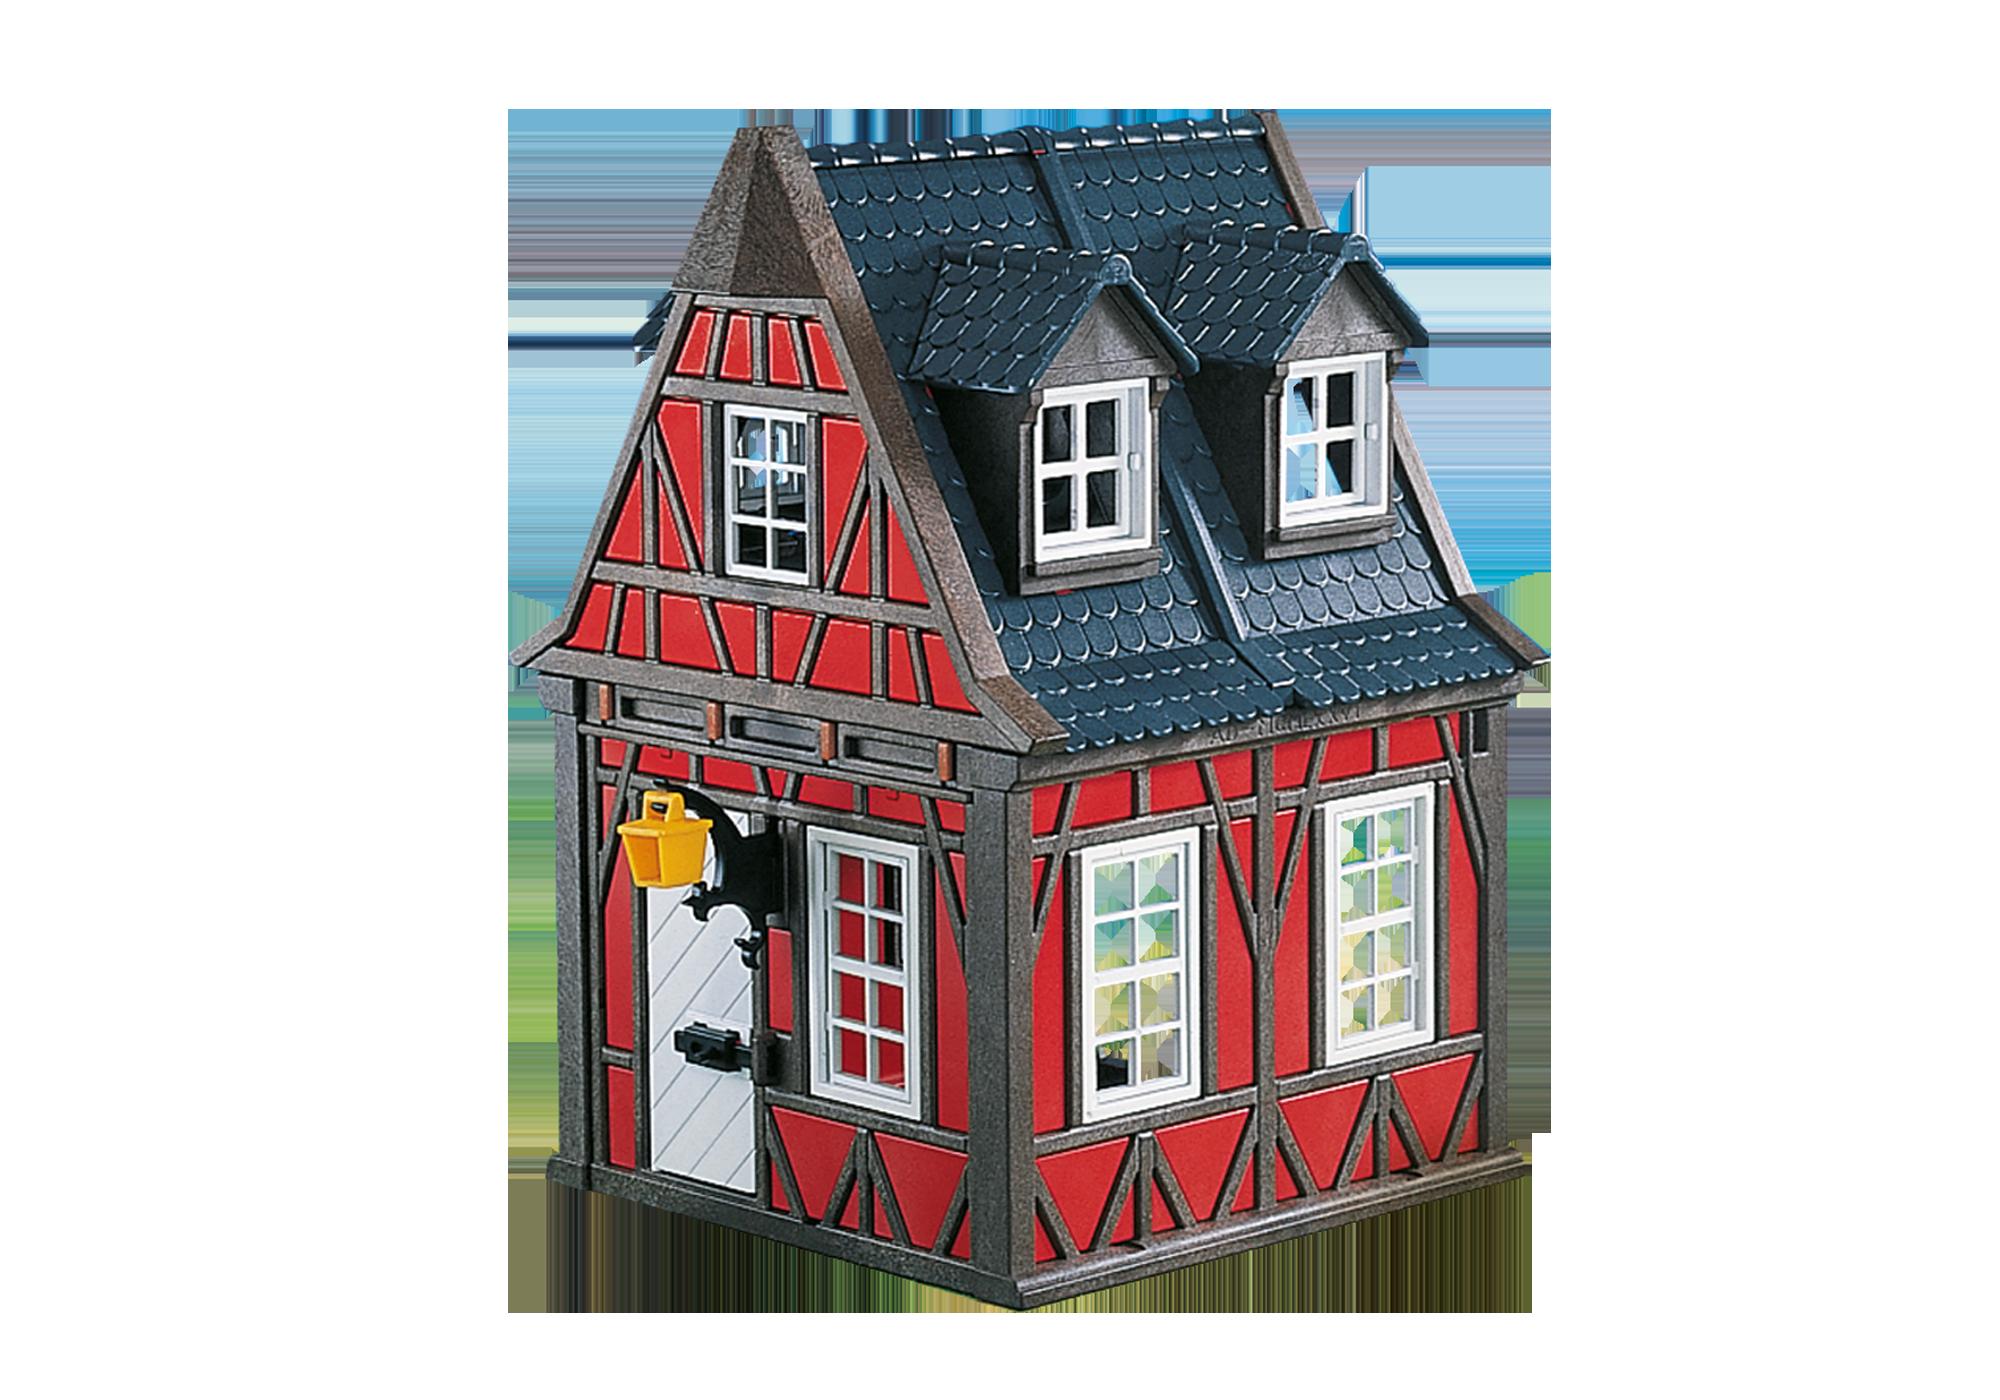 7785_product_detail/Casetta rossa medievale